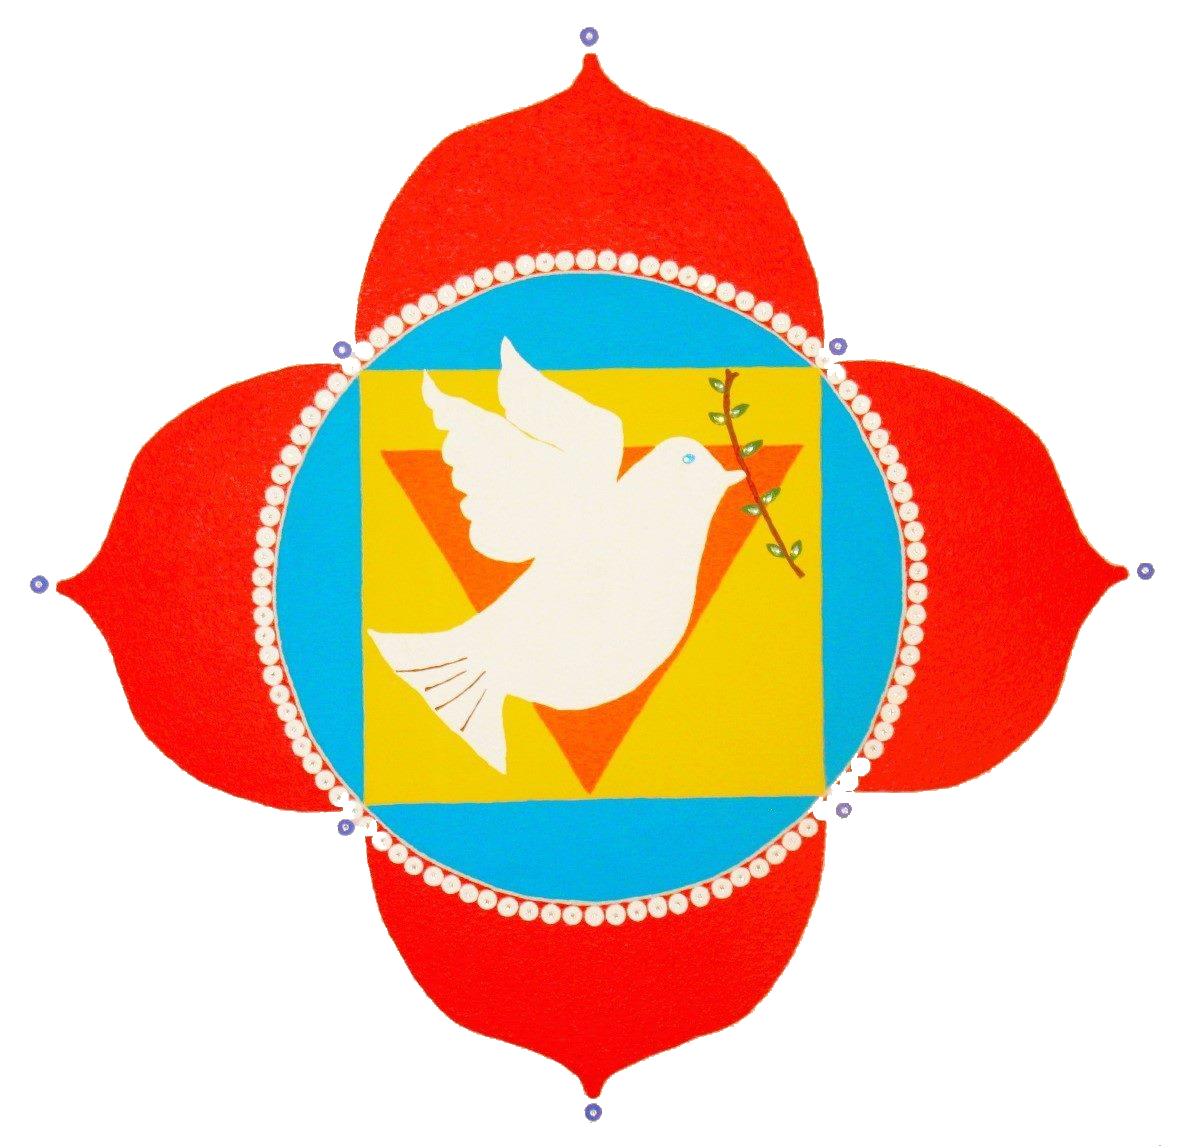 Meditation clipart spiritual wellness. Make peace yoga